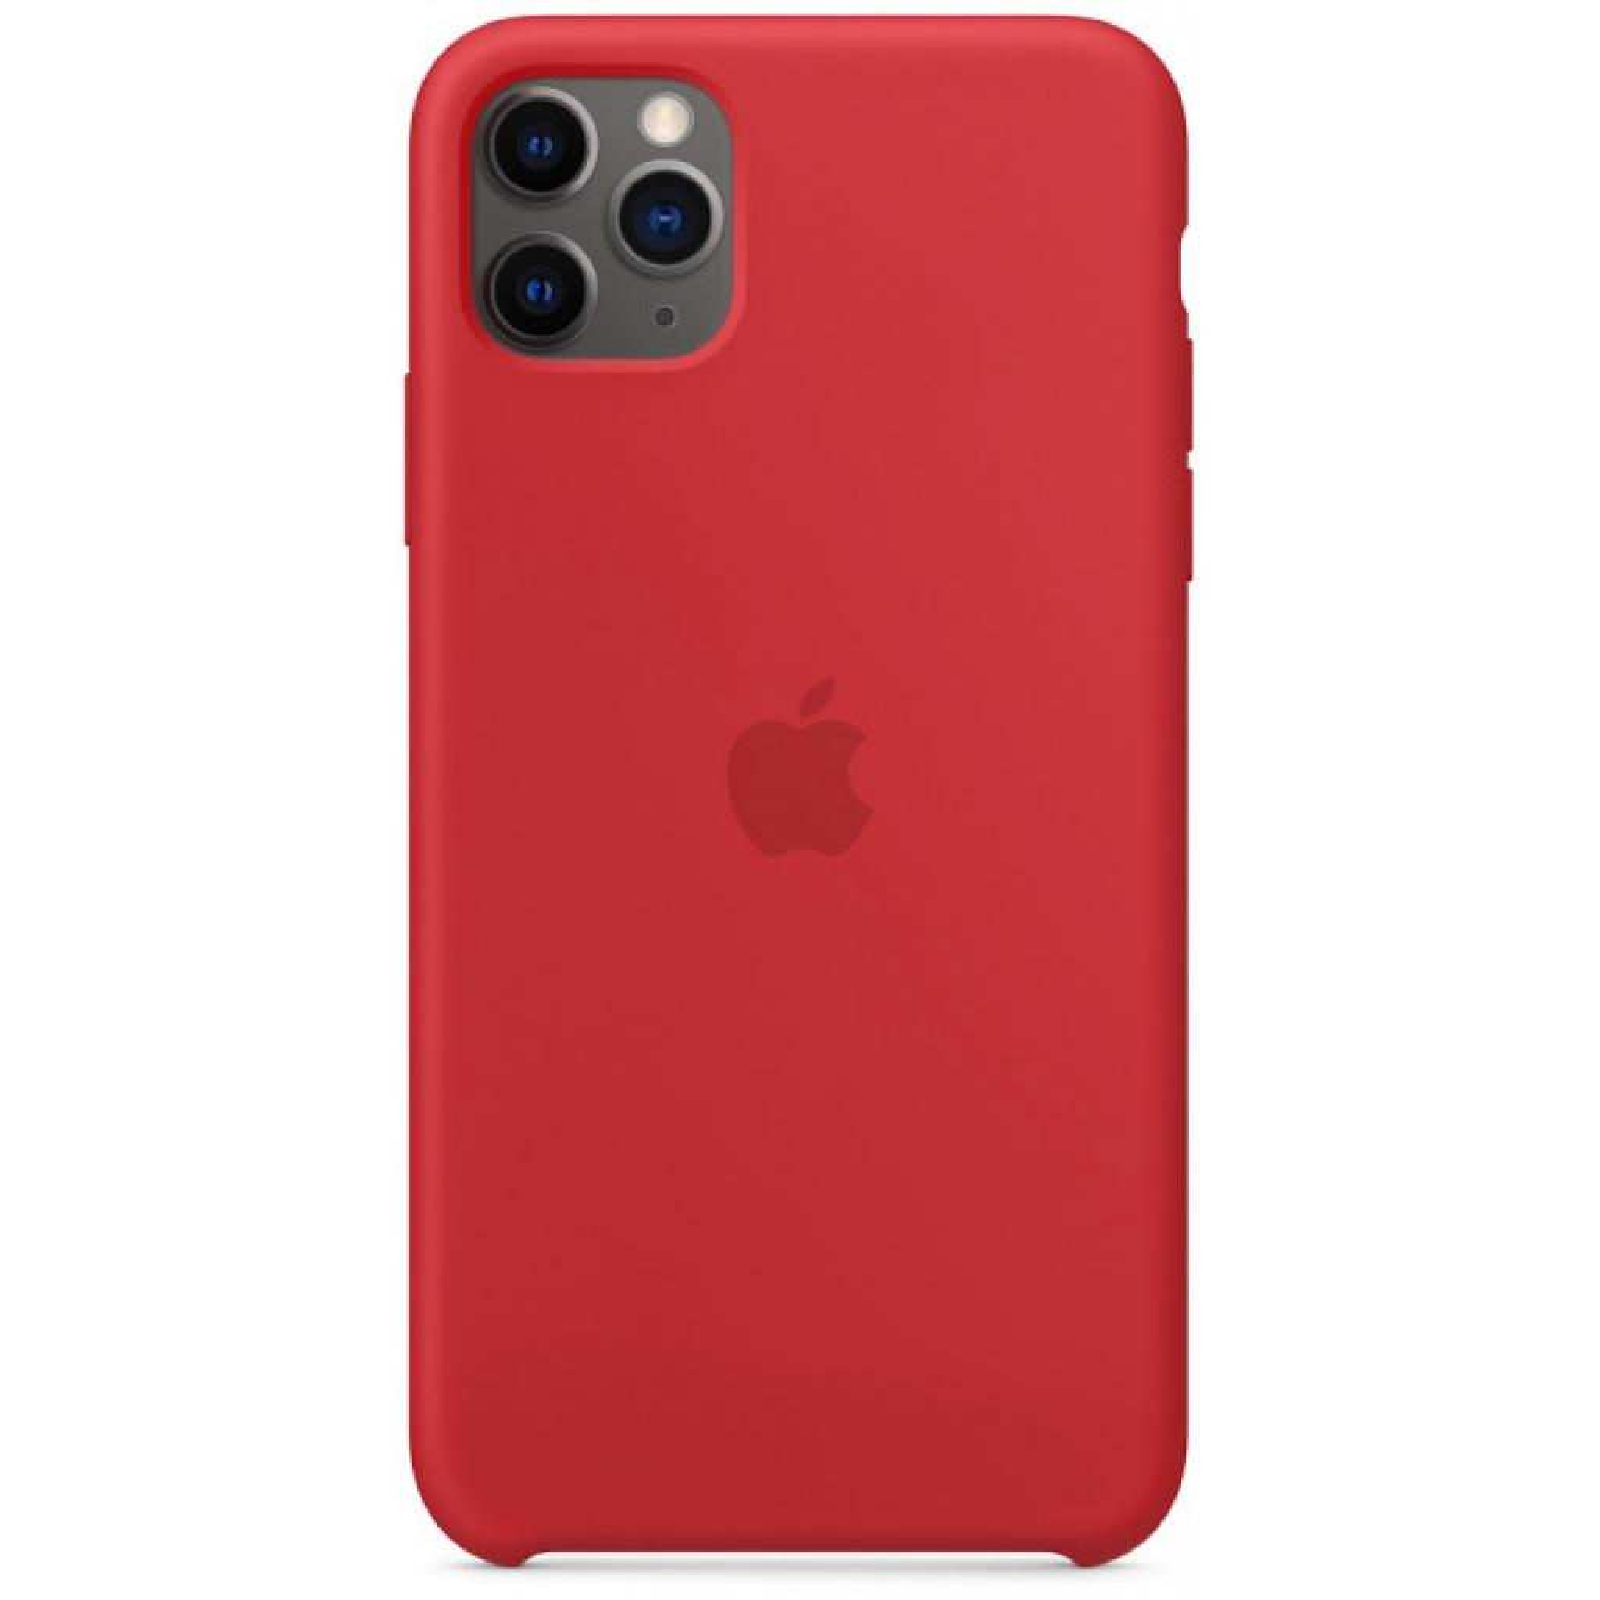 Чехол для моб. телефона Apple iPhone 11 Pro Max Silicone Case - Pine Green (MX012ZM/A)